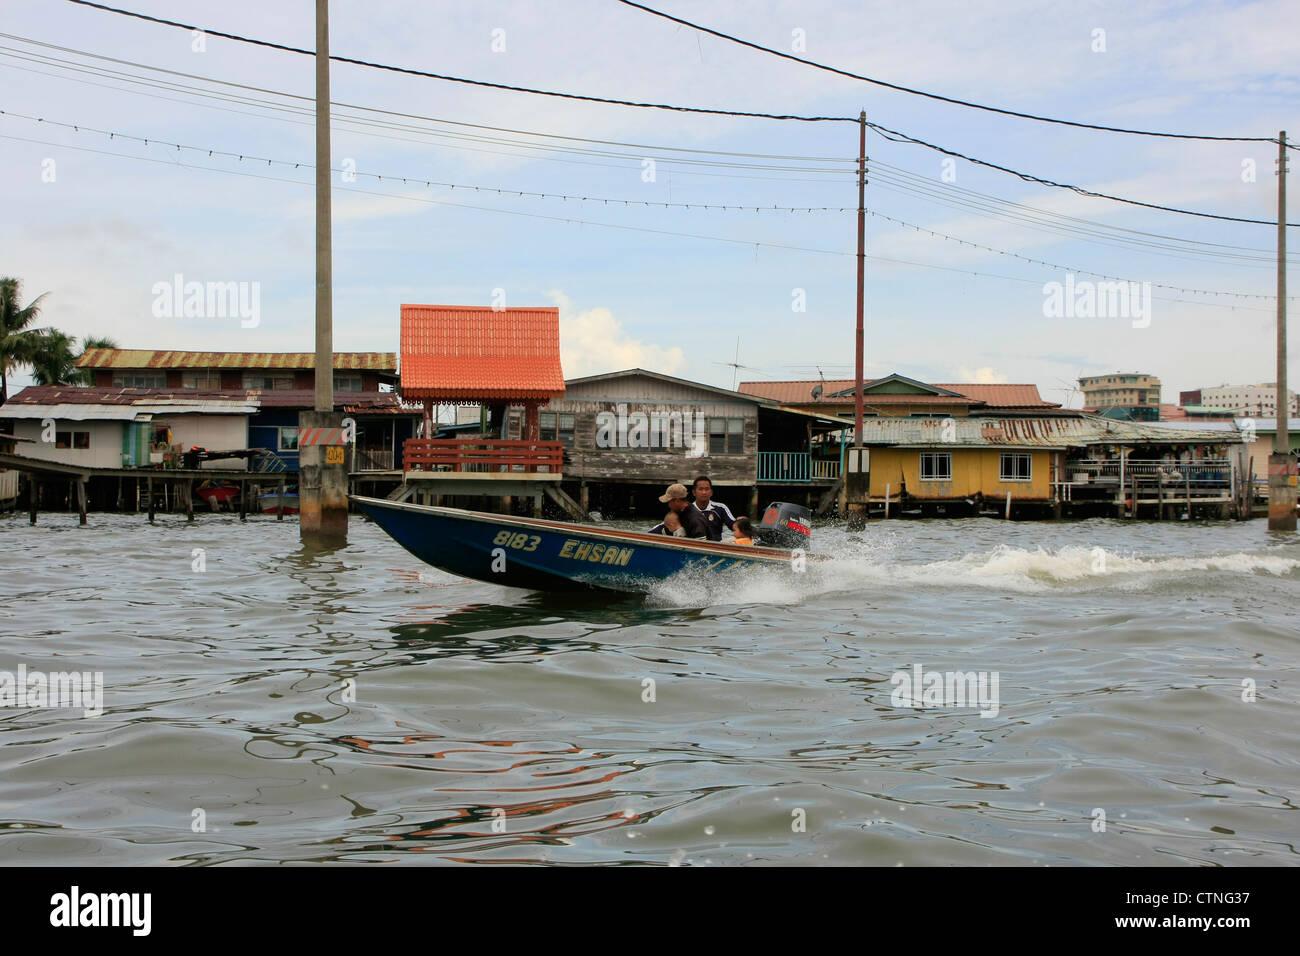 Kampong Ayer, Bandar Seri Begawan, Brunei, Southeast Asia - Stock Image